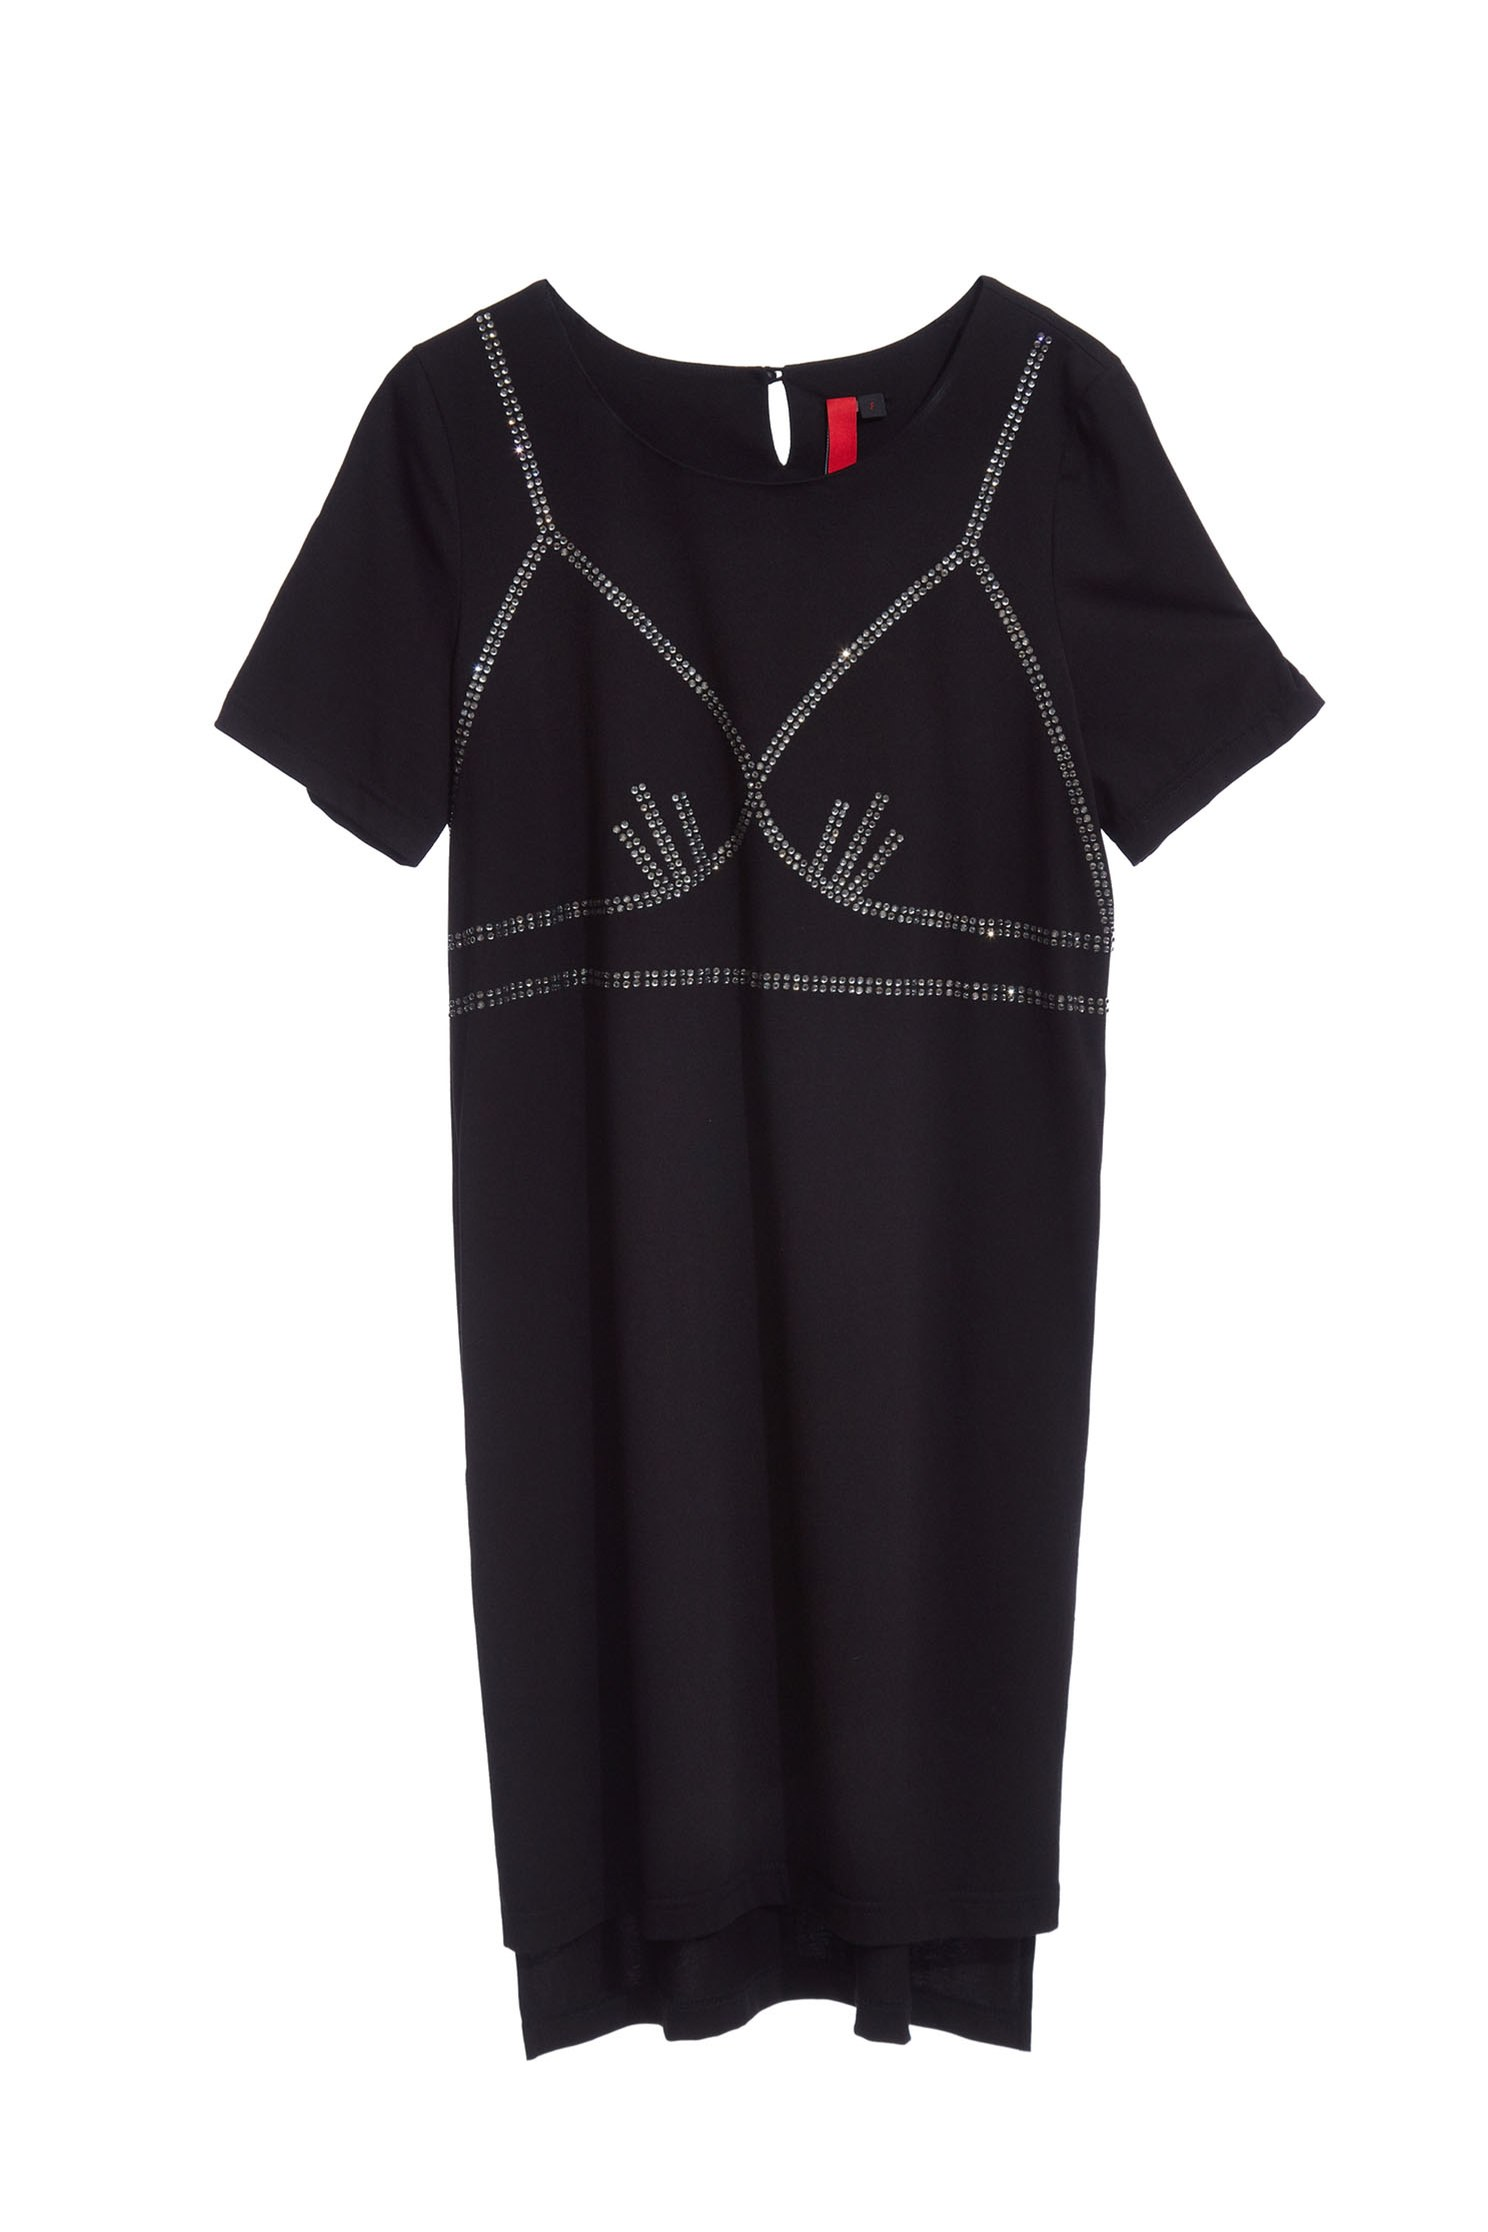 One-piece dress in bra printing